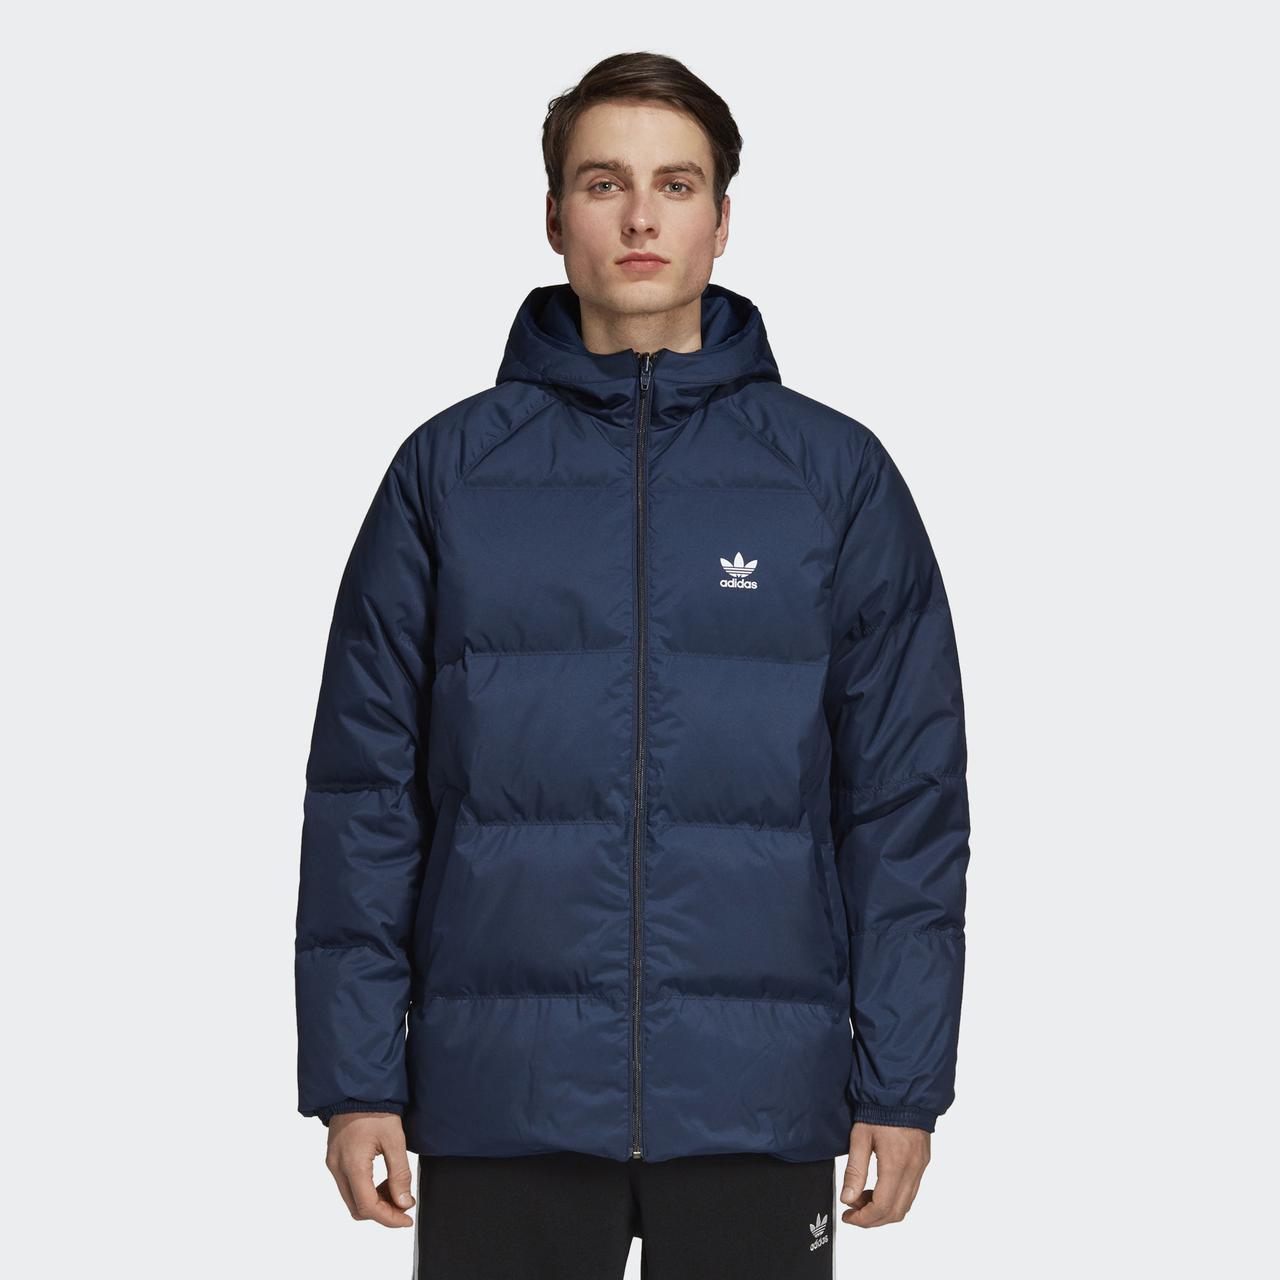 a97f5b9218f3 Мужская куртка Adidas Originals SST (Артикул  DH5004) - Адидас официальный  интернет - магазин